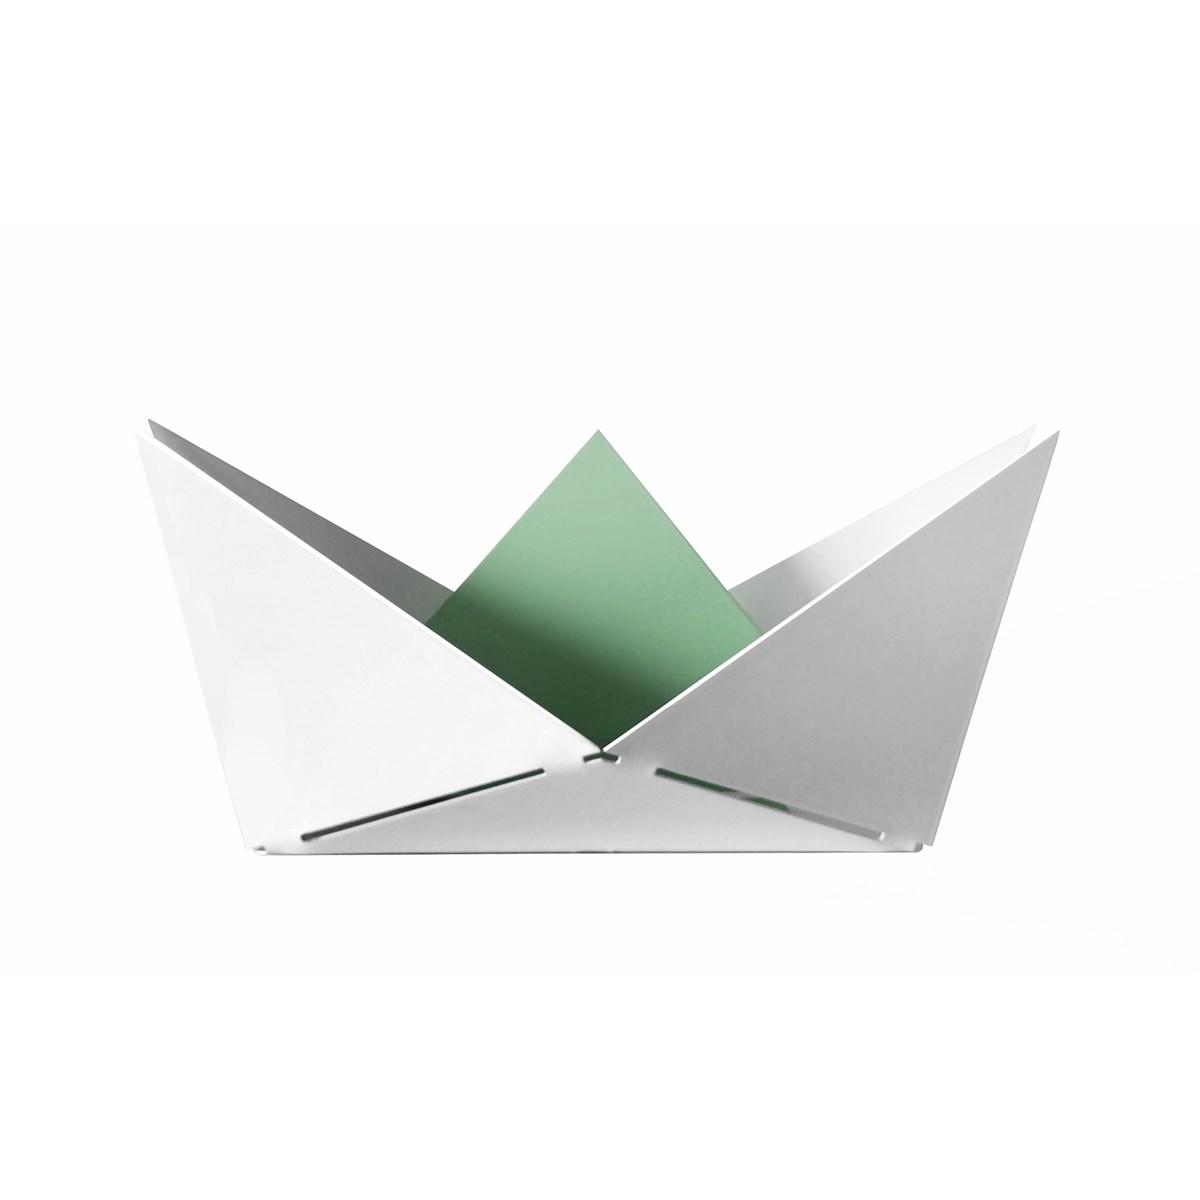 Vide poche en métal vert